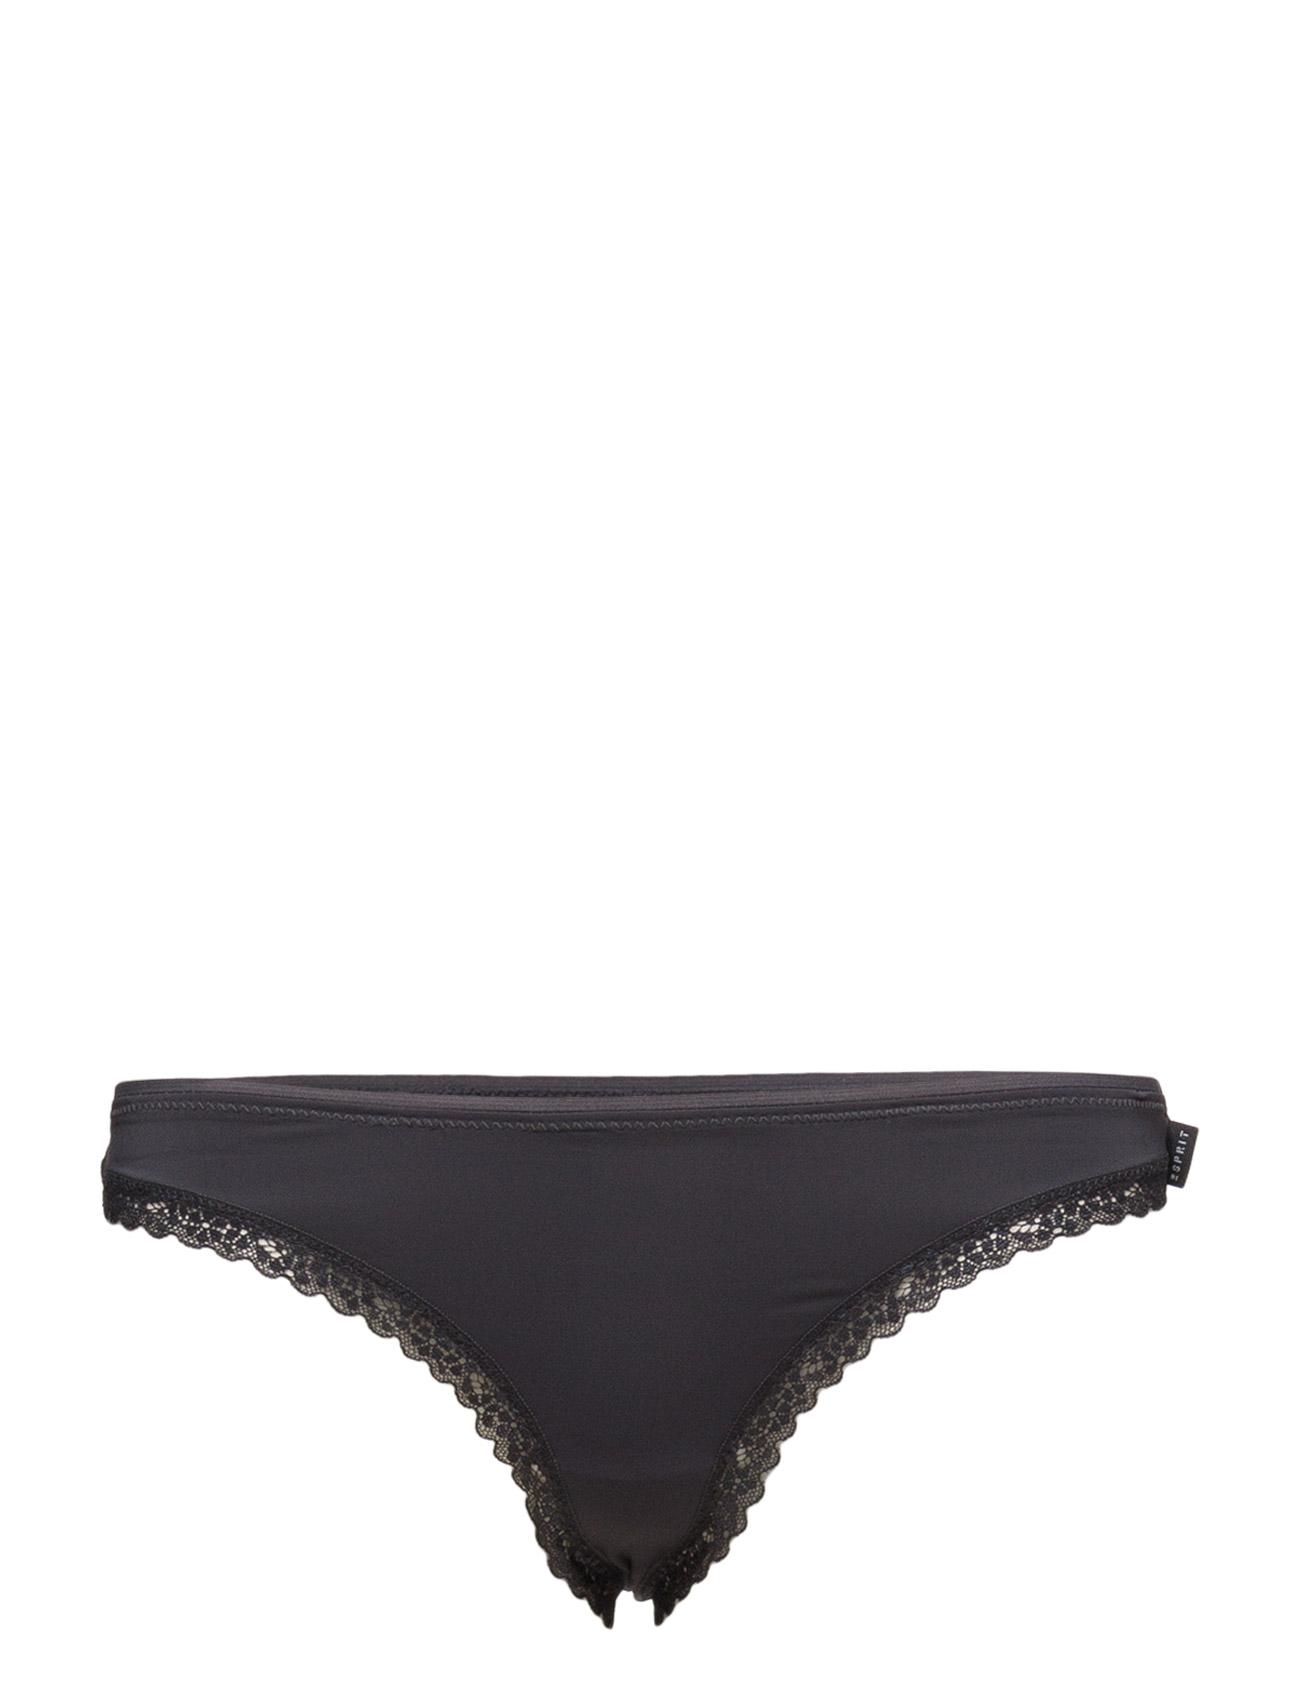 be42f7aff162 Bottoms (Dark Grey) (£10) - Esprit Bodywear Women - Briefs | Boozt.com